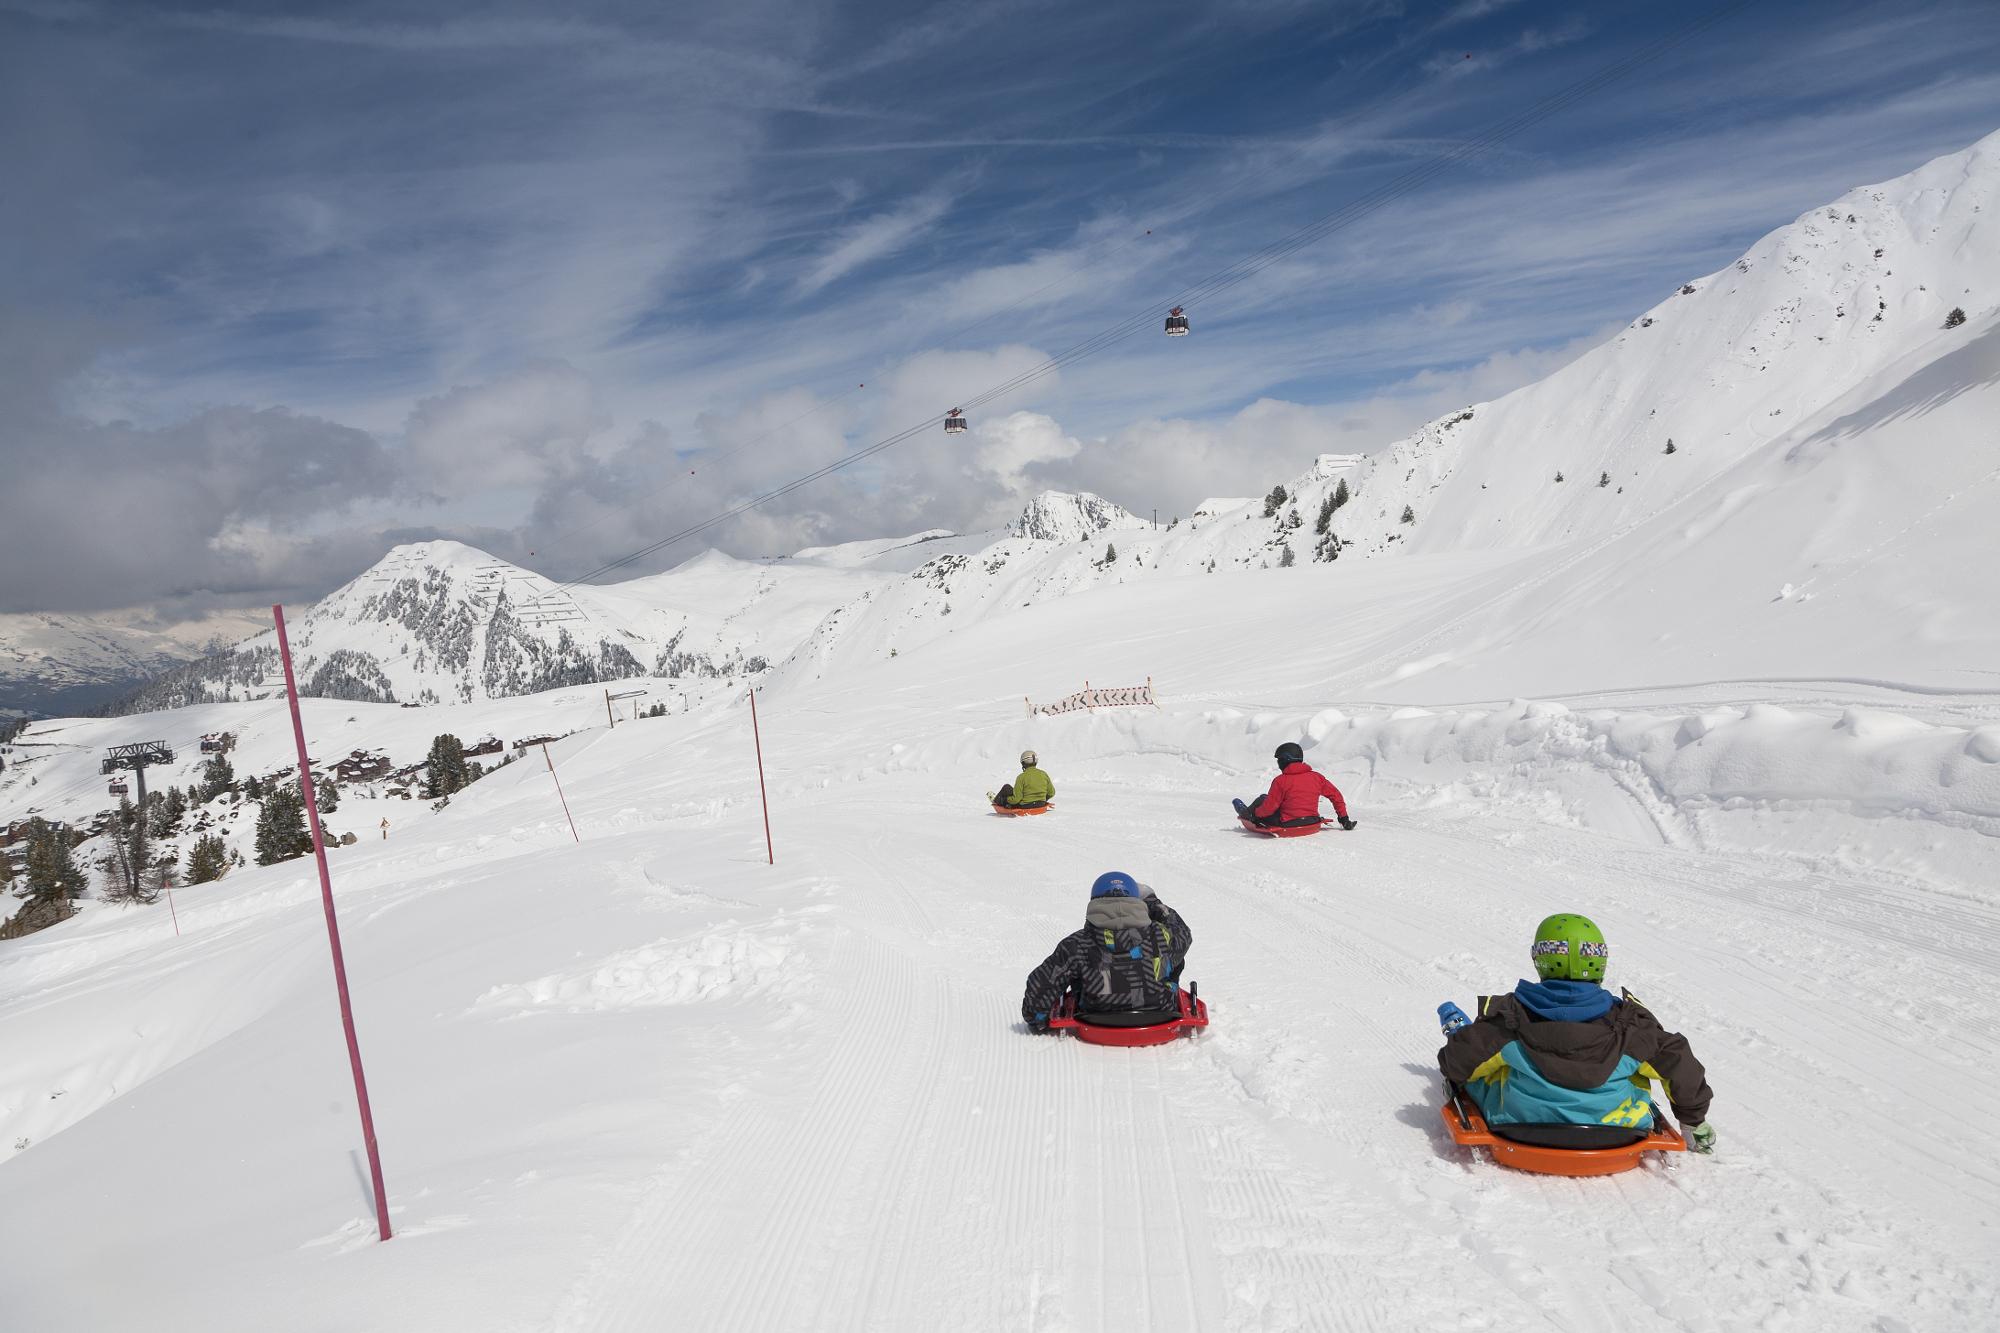 skigebiet la plagne skifahren pistenplan apr s ski. Black Bedroom Furniture Sets. Home Design Ideas